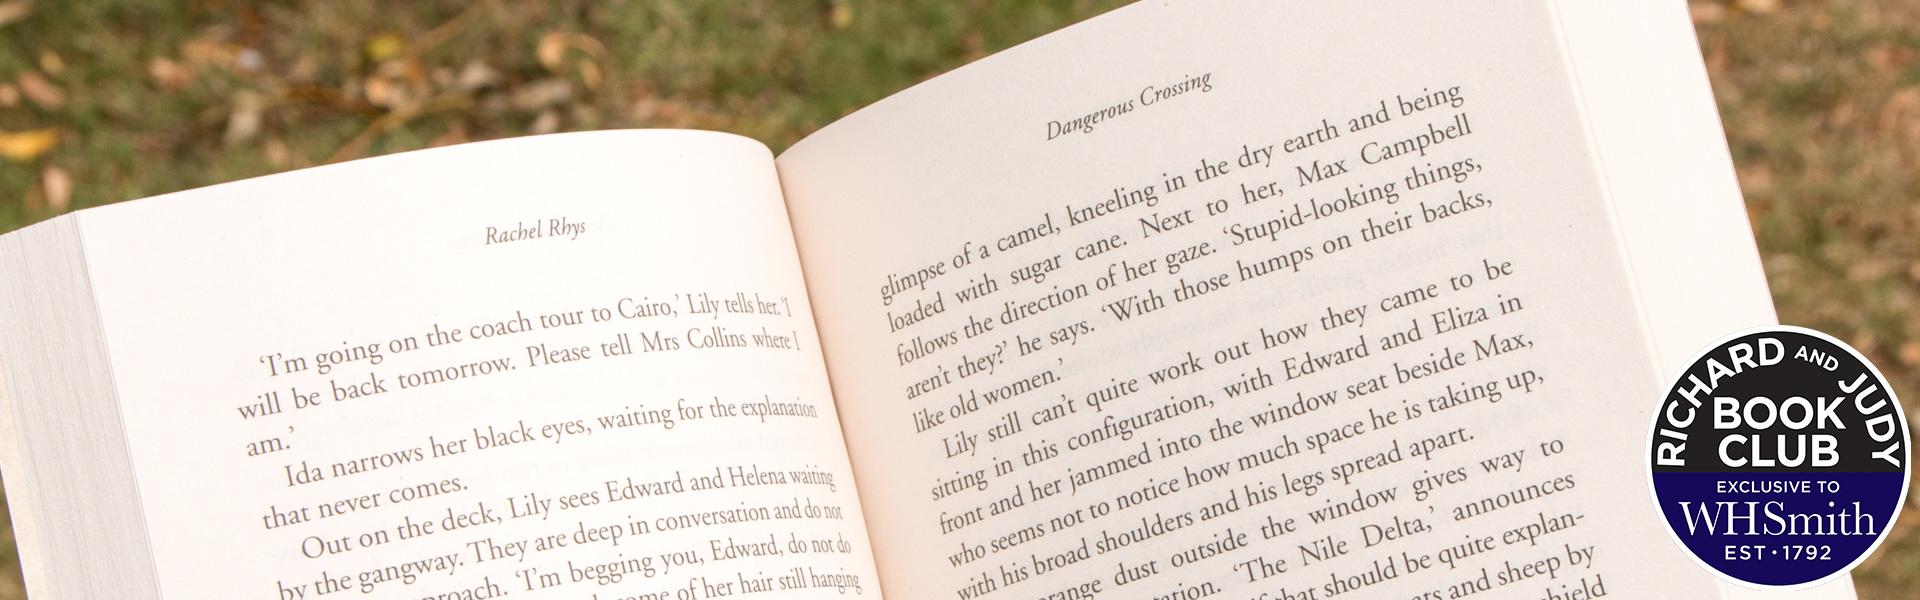 Read an Extract from Dangerous Crossing by Rachel Rhys